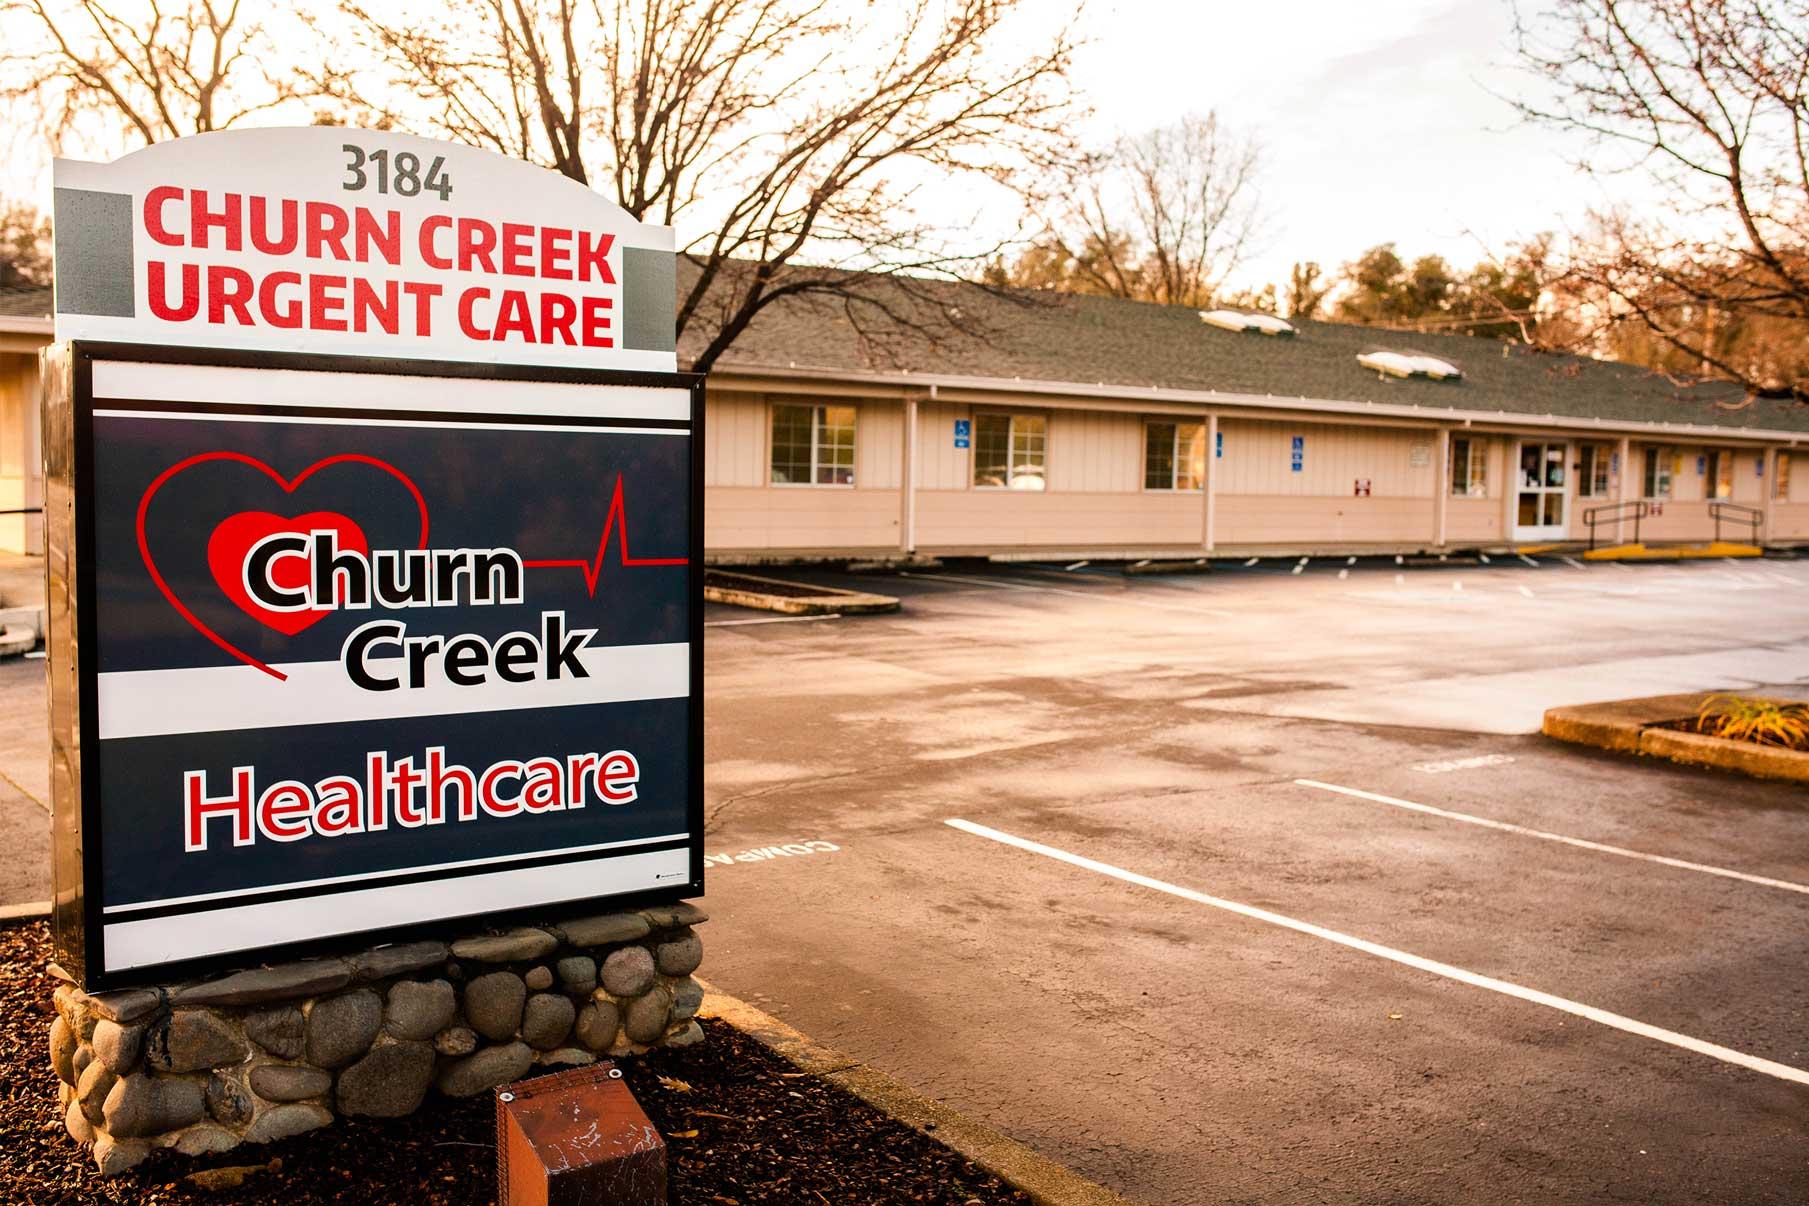 Churn Creek Healthcare